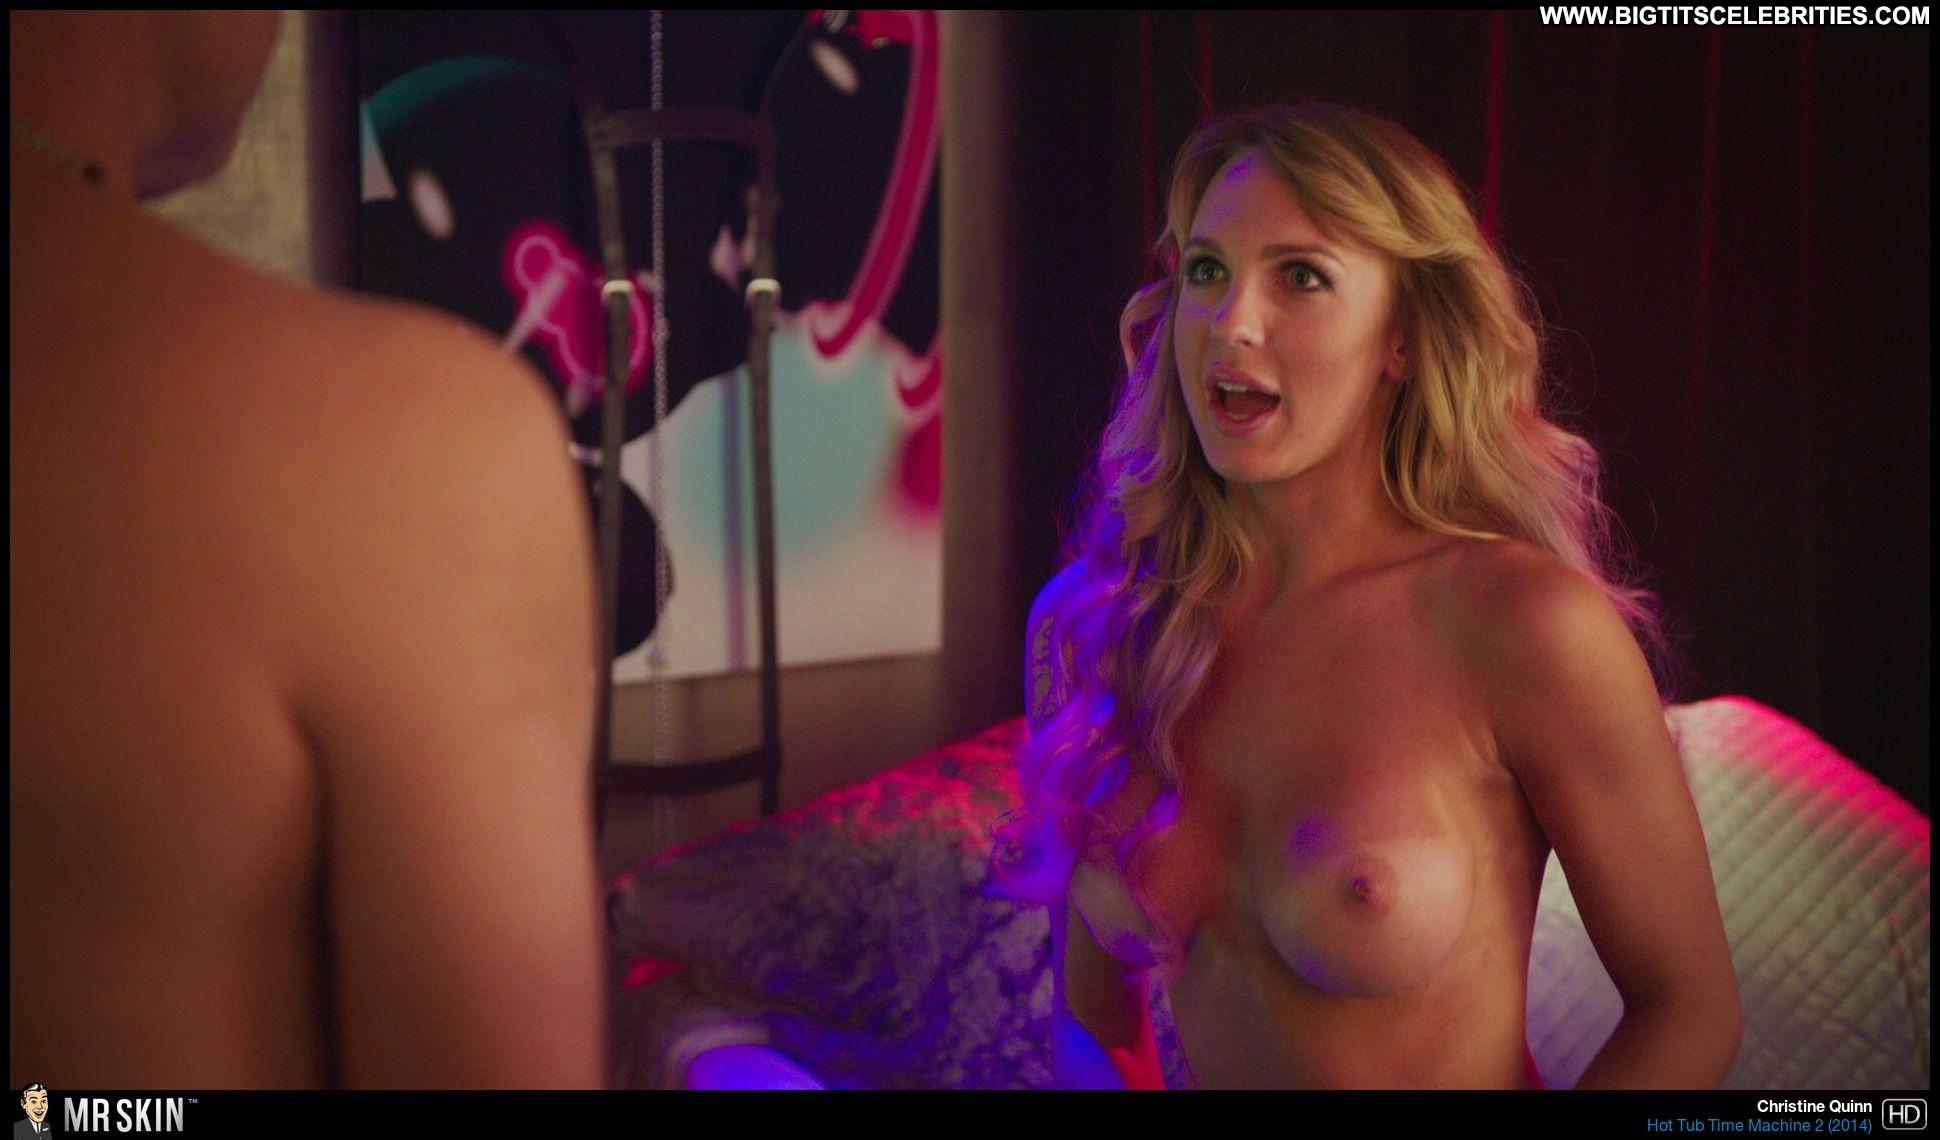 Blonde Big Tits Nude 71